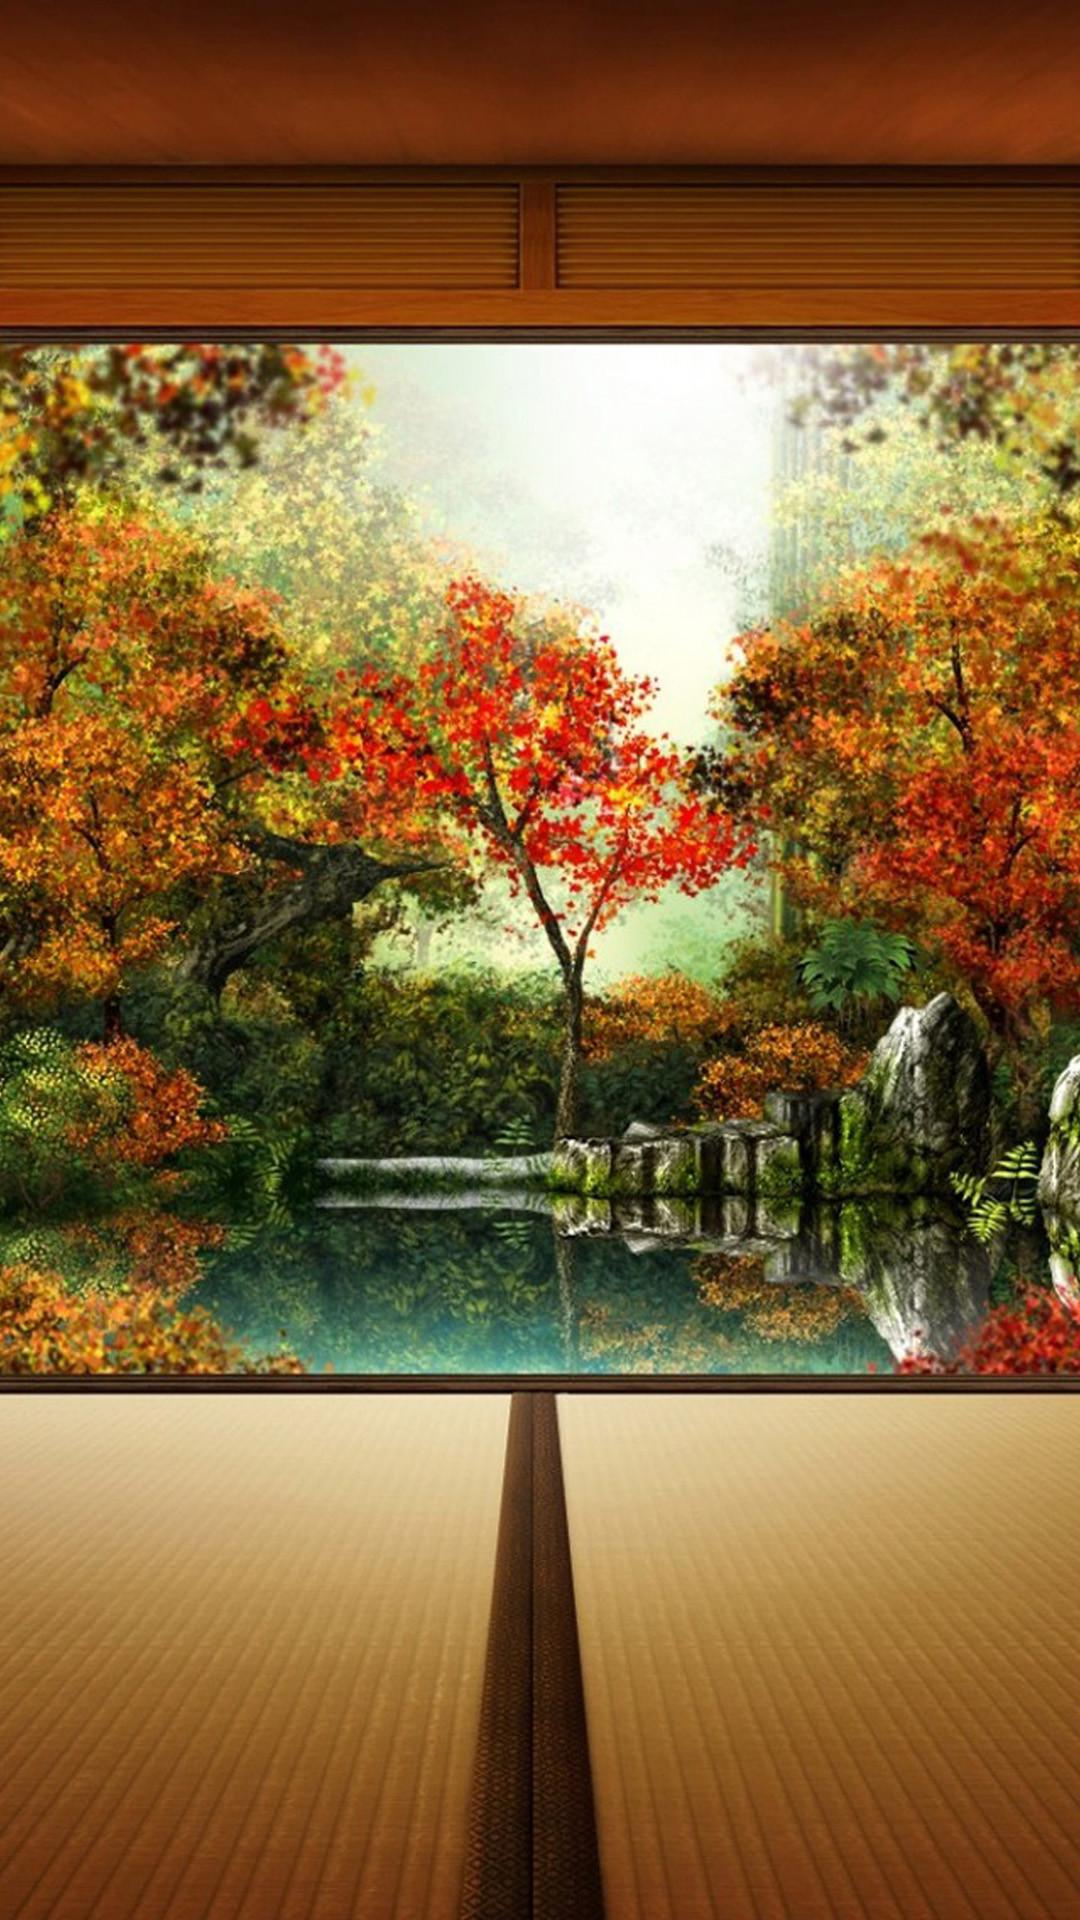 Rain Fall Hd Wallpaper Download Iphone 6 Autumn Wallpaper 87 Images